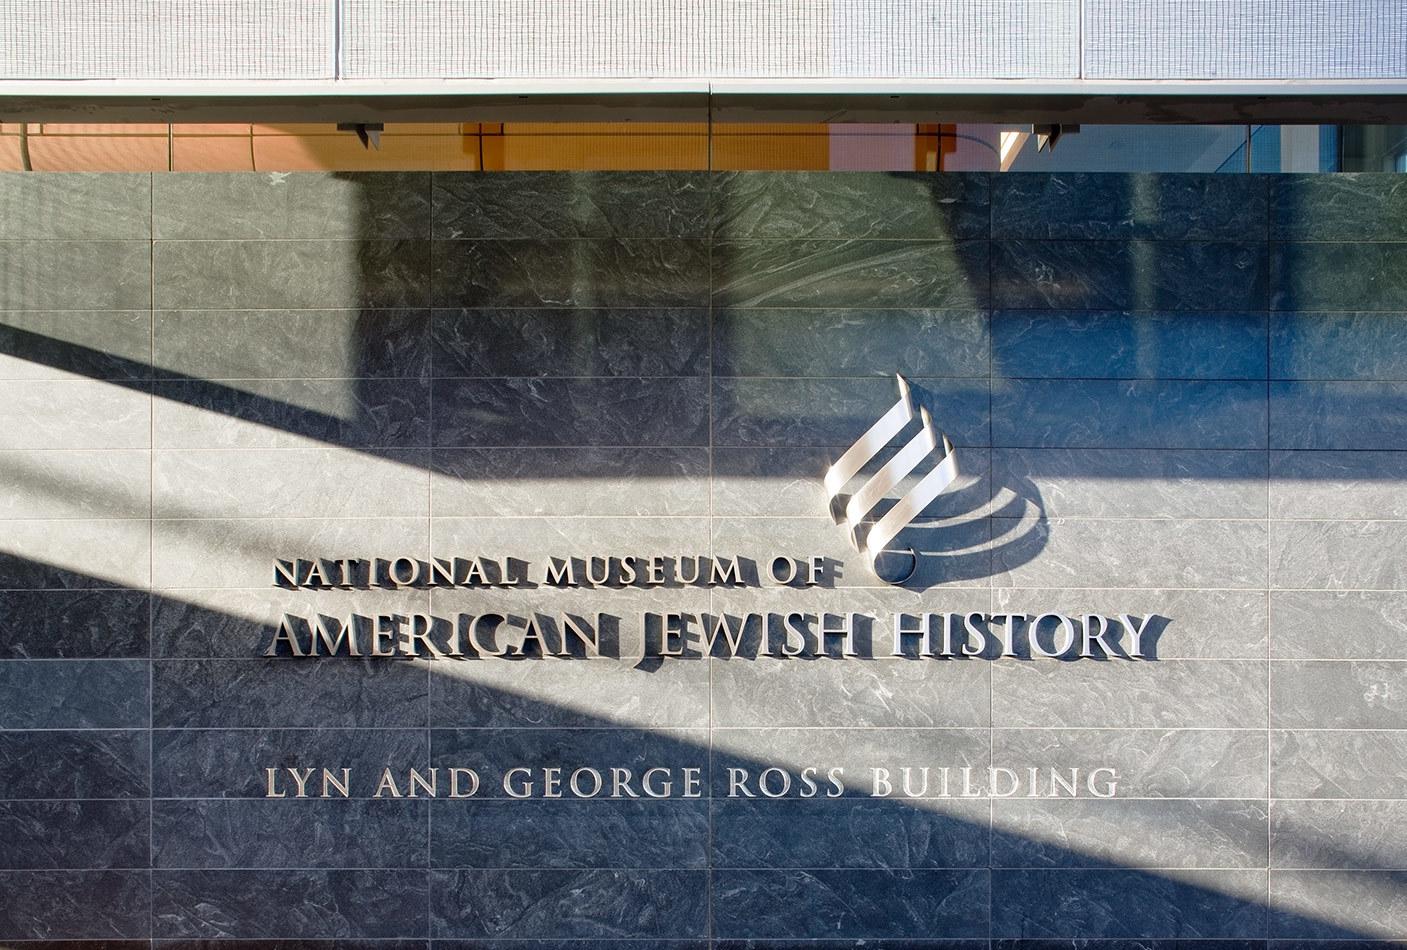 The American Jewish History Museum